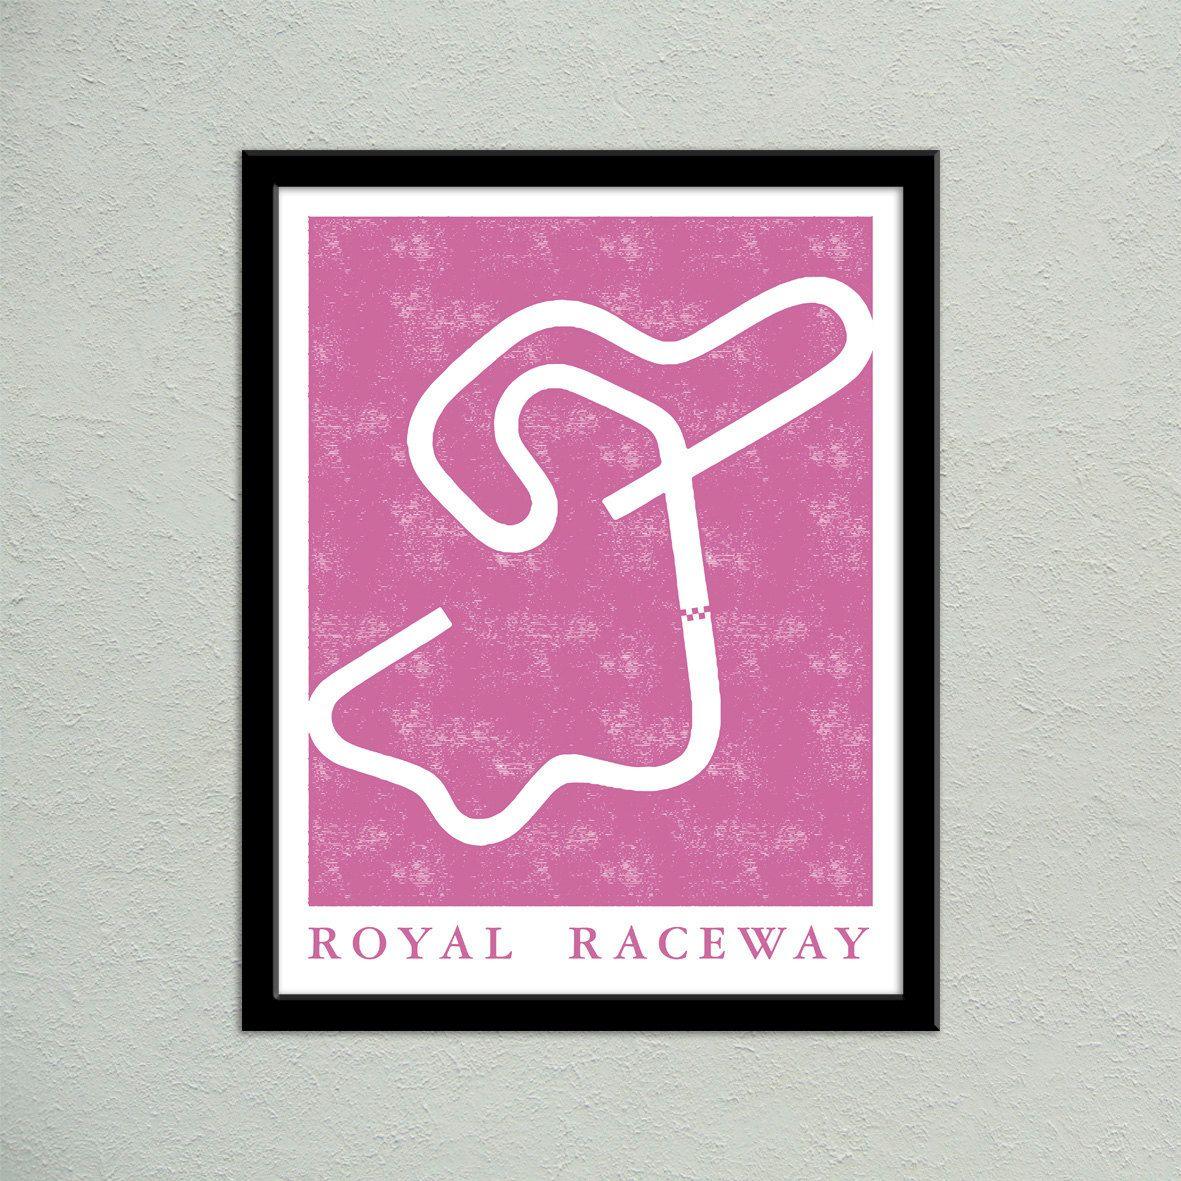 Pidesignprints on etsy mario kart 64 royal raceway track map pidesignprints on etsy mario kart 64 royal raceway track map poster super mario kart gumiabroncs Gallery